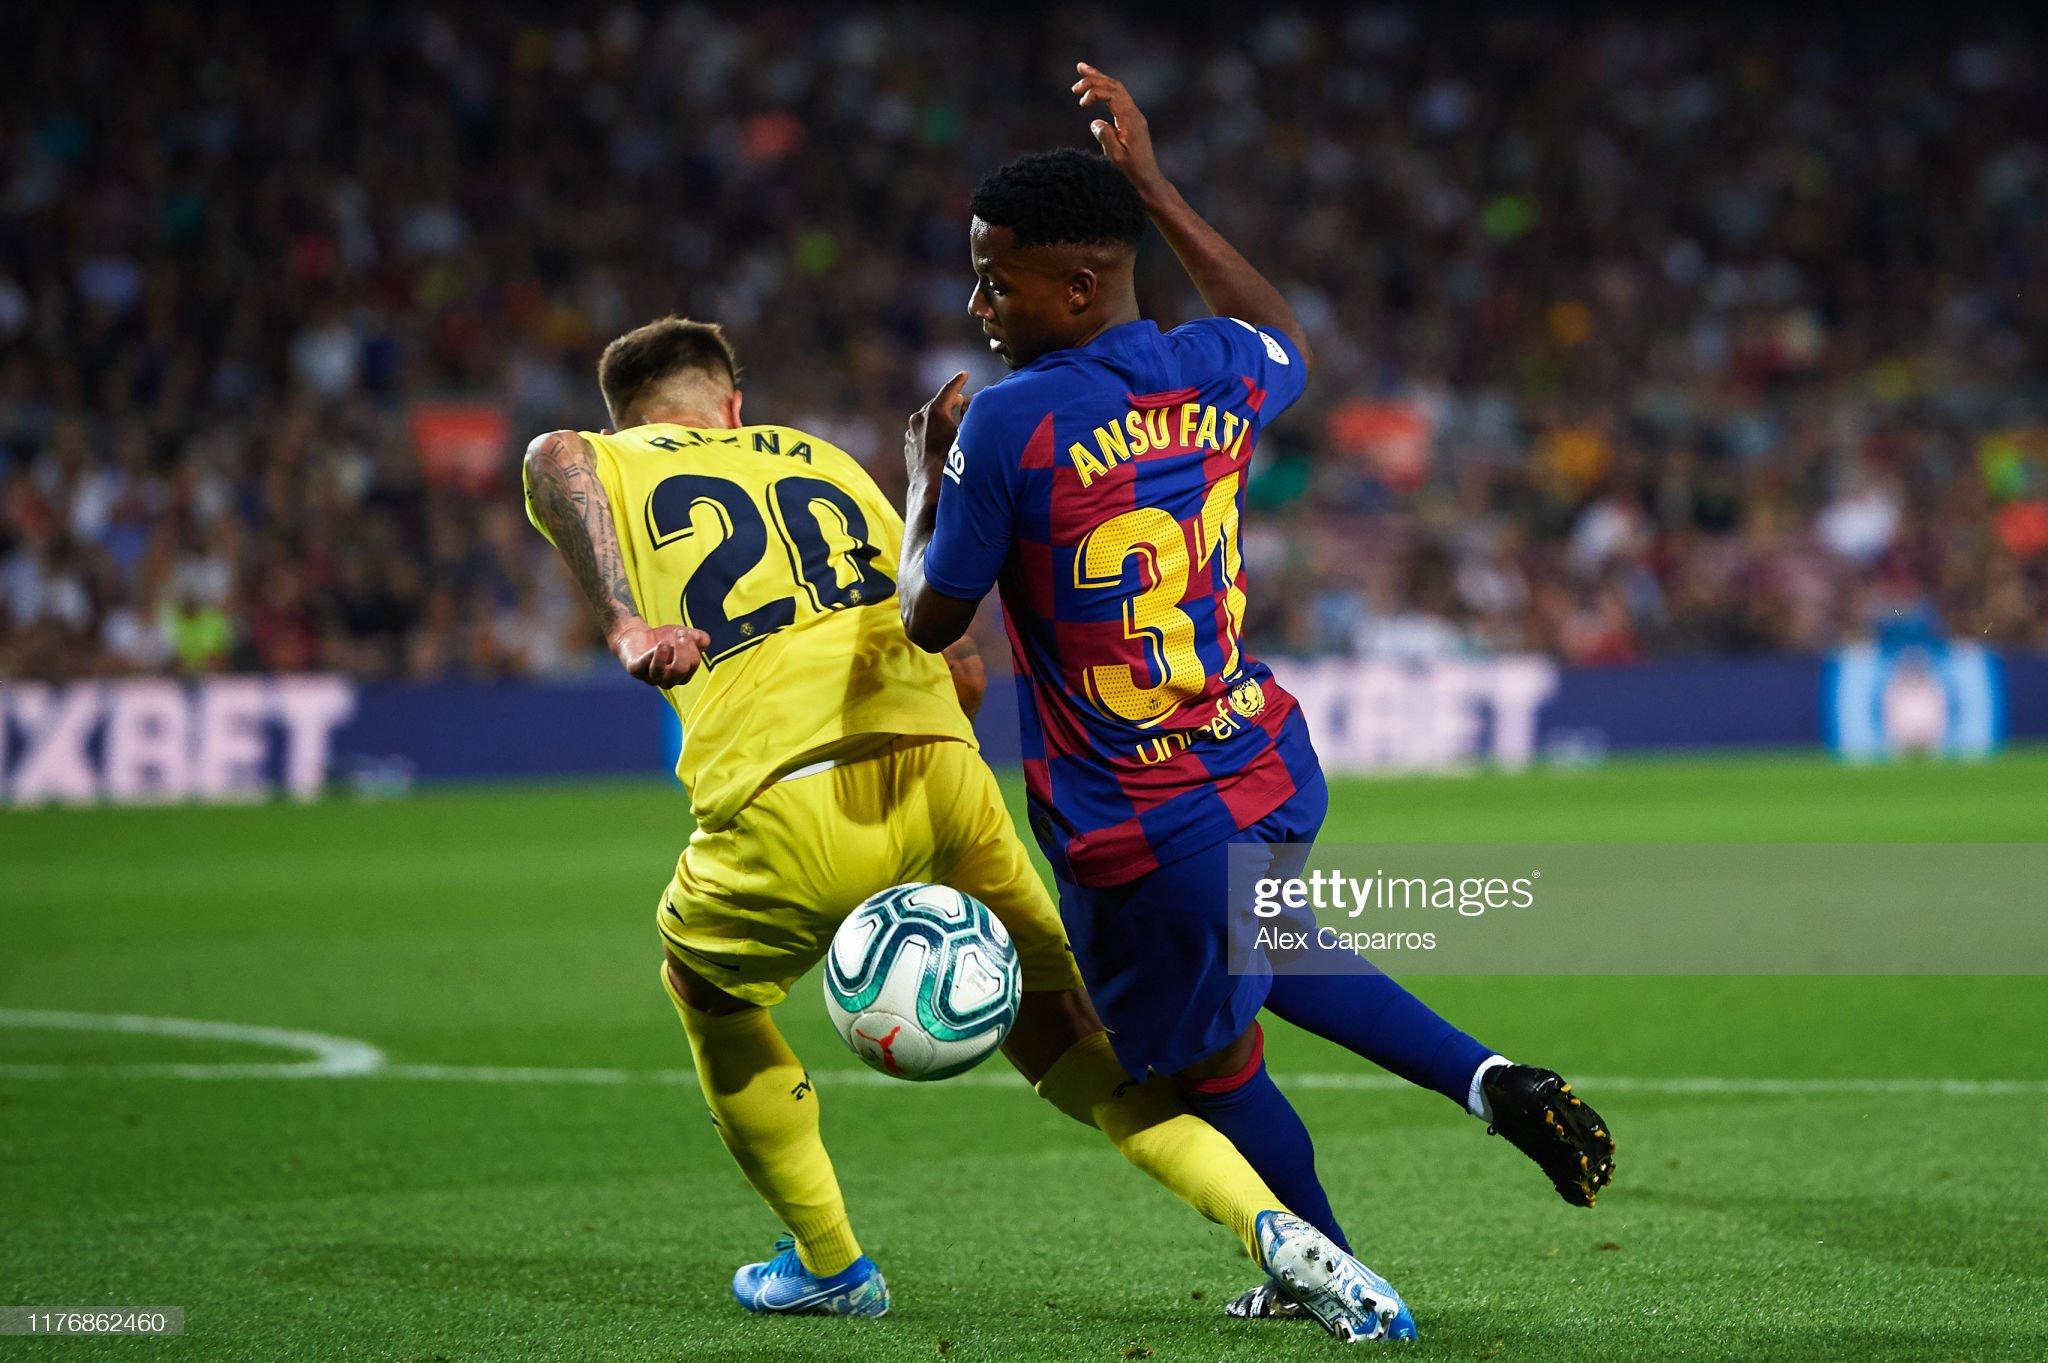 صور مباراة : برشلونة - فياريال 2-1 ( 24-09-2019 )  Ruben-pena-of-villarreal-cf-tackles-ansu-fati-of-fc-barcelona-inside-picture-id1176862460?s=2048x2048